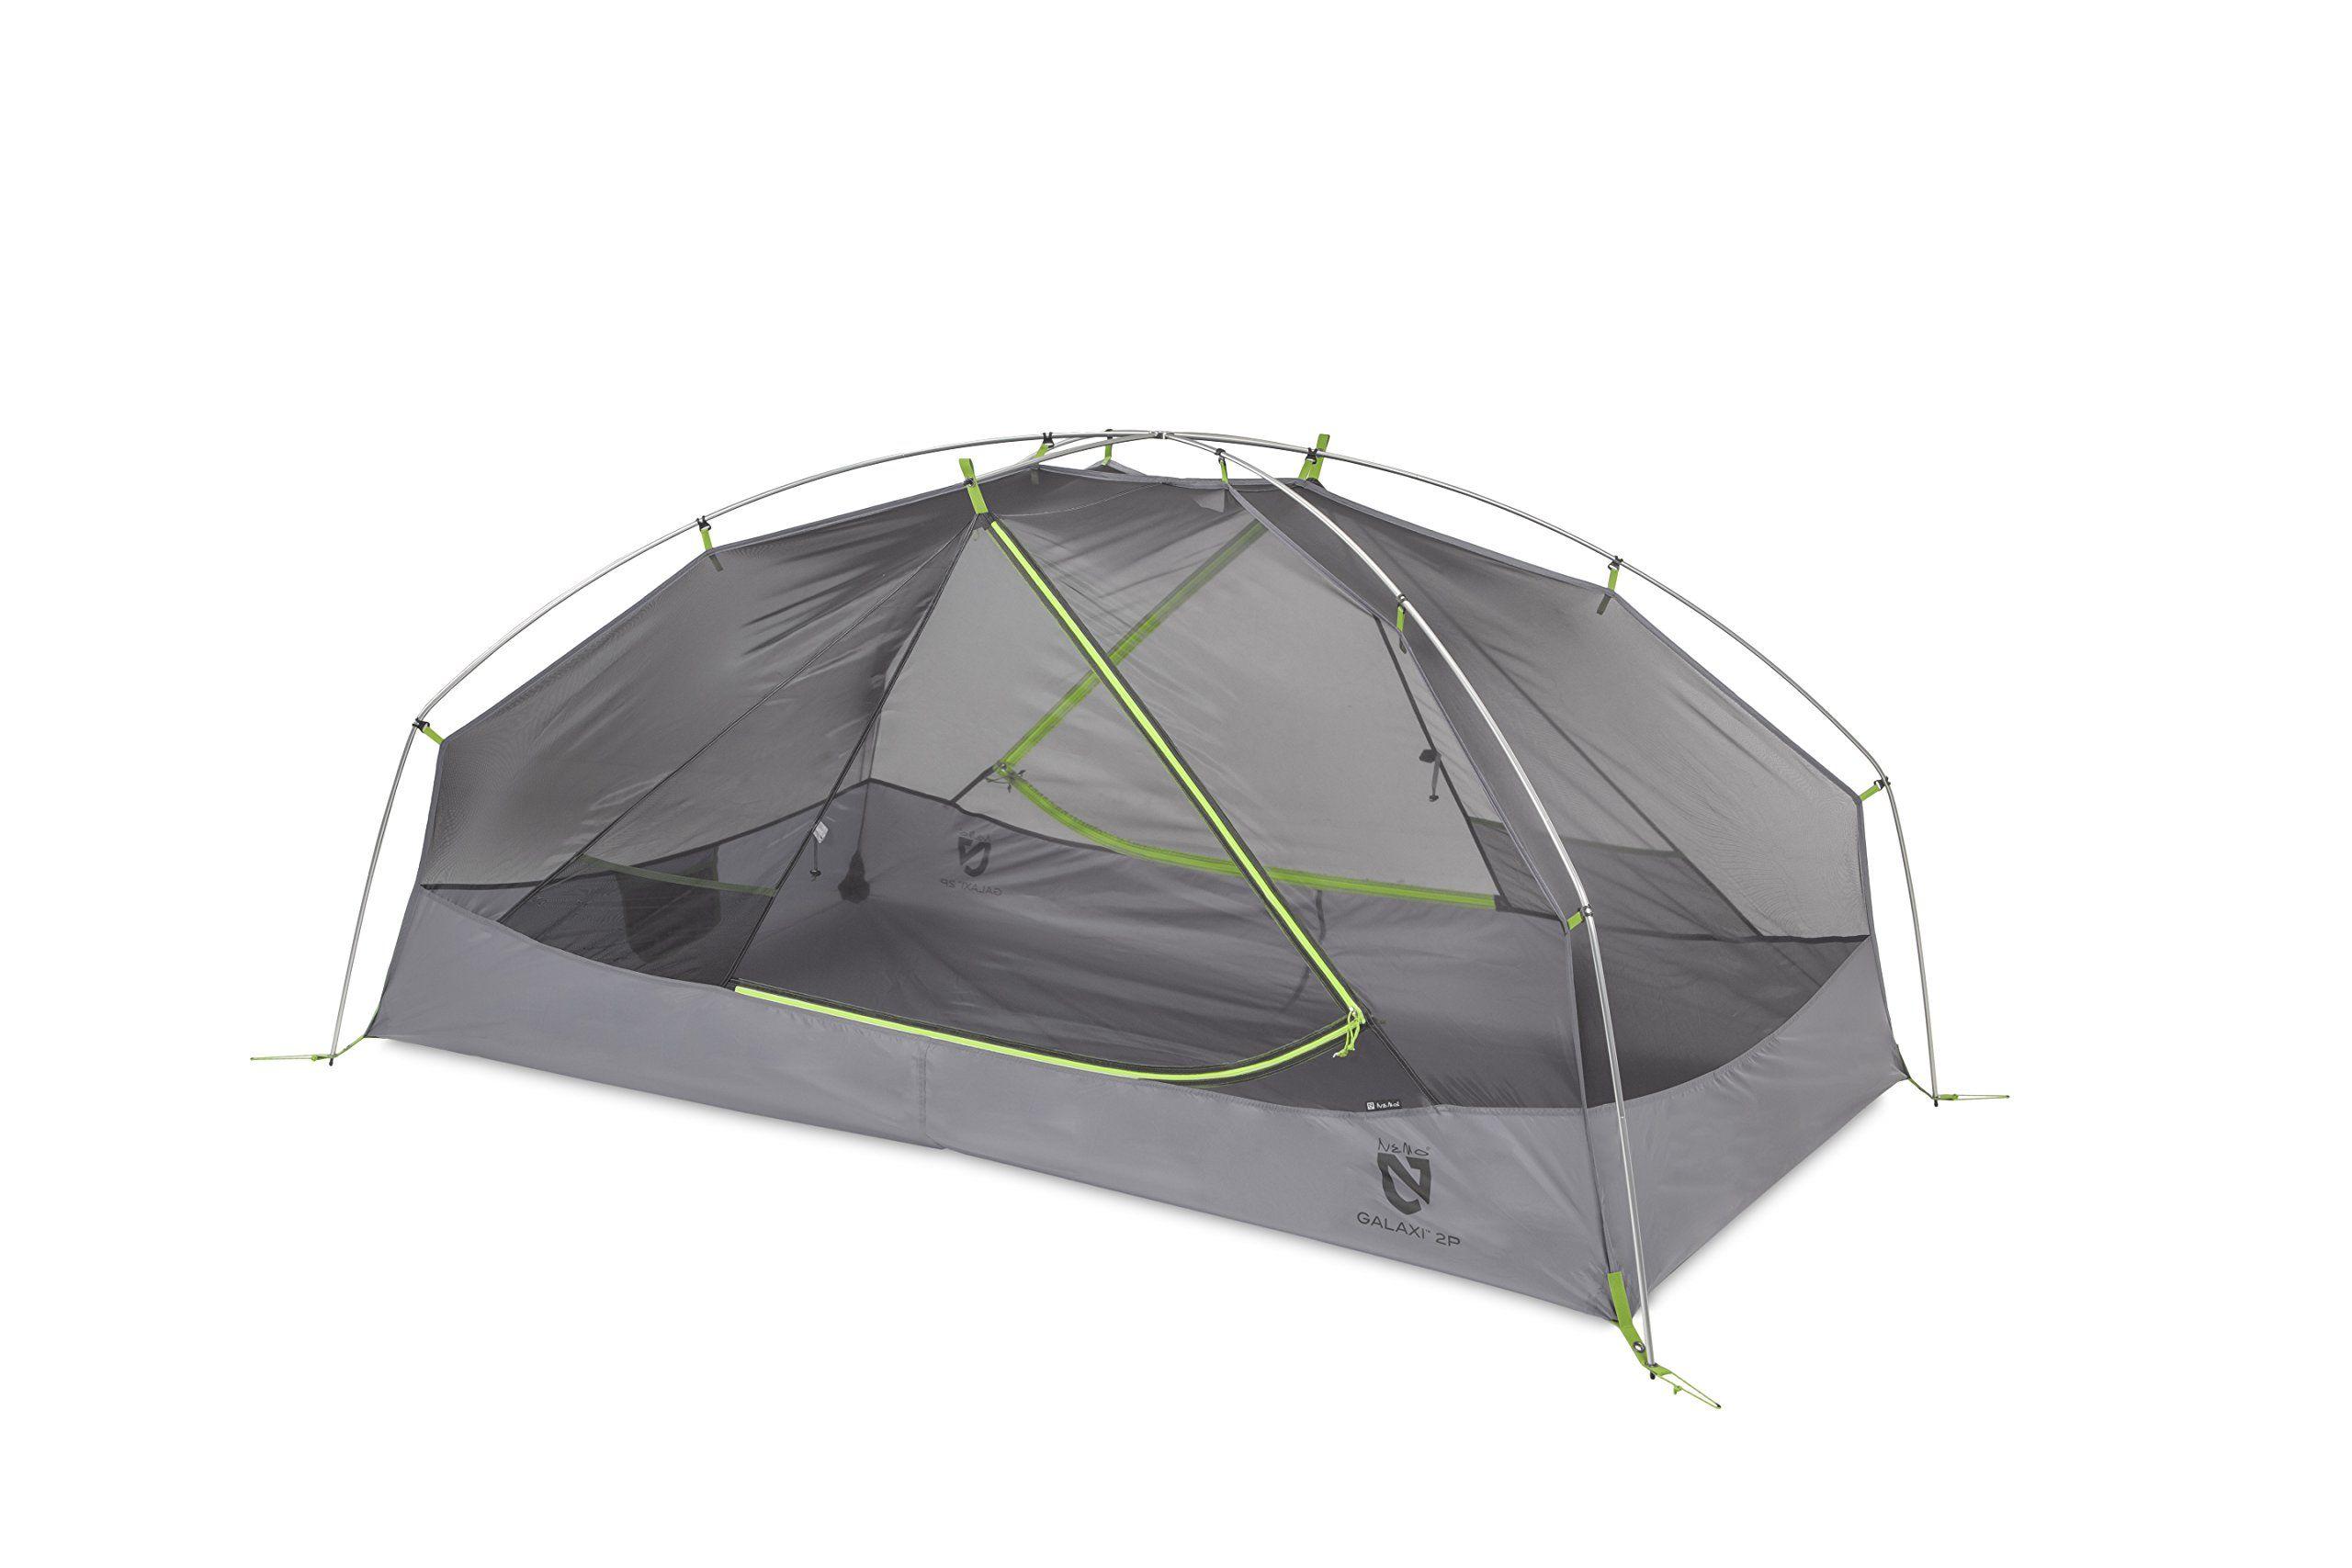 Nemo Galaxi 2p Canyon Tent Footprint Backpacking Tent Tent